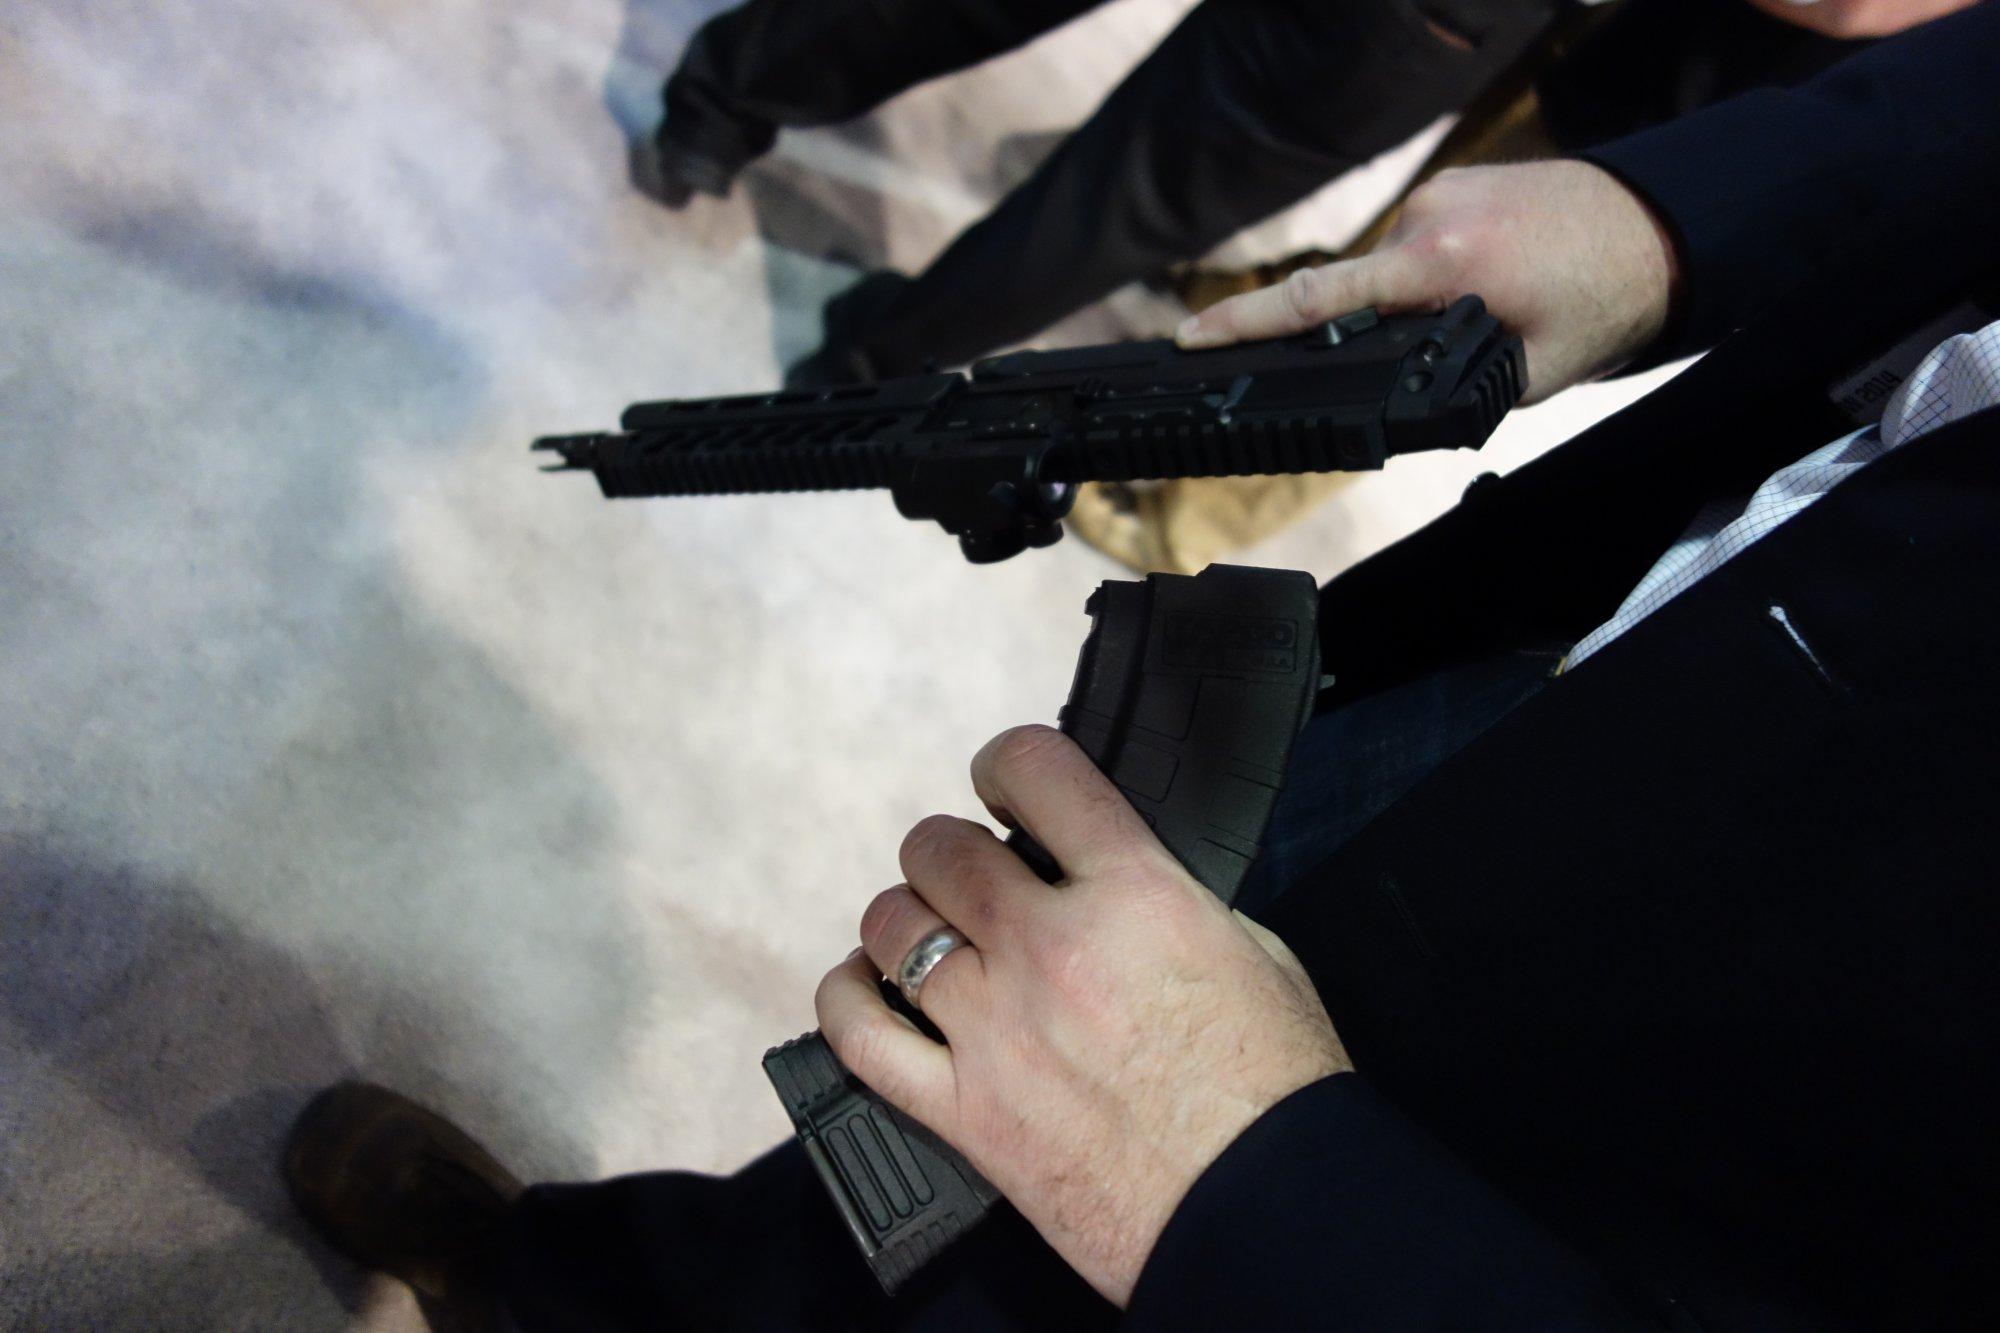 SIG SAUER SIG556xi 7.62x39mm Russian Configuration Semi Auto Only Modular Multi Caliber Combat Tactical Carbine Kalashnikov AK 47 AKM SHOT Show 2014 1 15 14 David Crane DefenseReview.com DR 1 rotated SIG SAUER SIG556xi Modular, Multi Caliber (5.56mm NATO, 300 AAC Blackout/300BLK, 7.62x39mm Russian) Gas Piston/Op Rod Combat/Tactical Rifle/Carbine/SBR with Kalashnikov AK 47/AKM Configuration Capability!